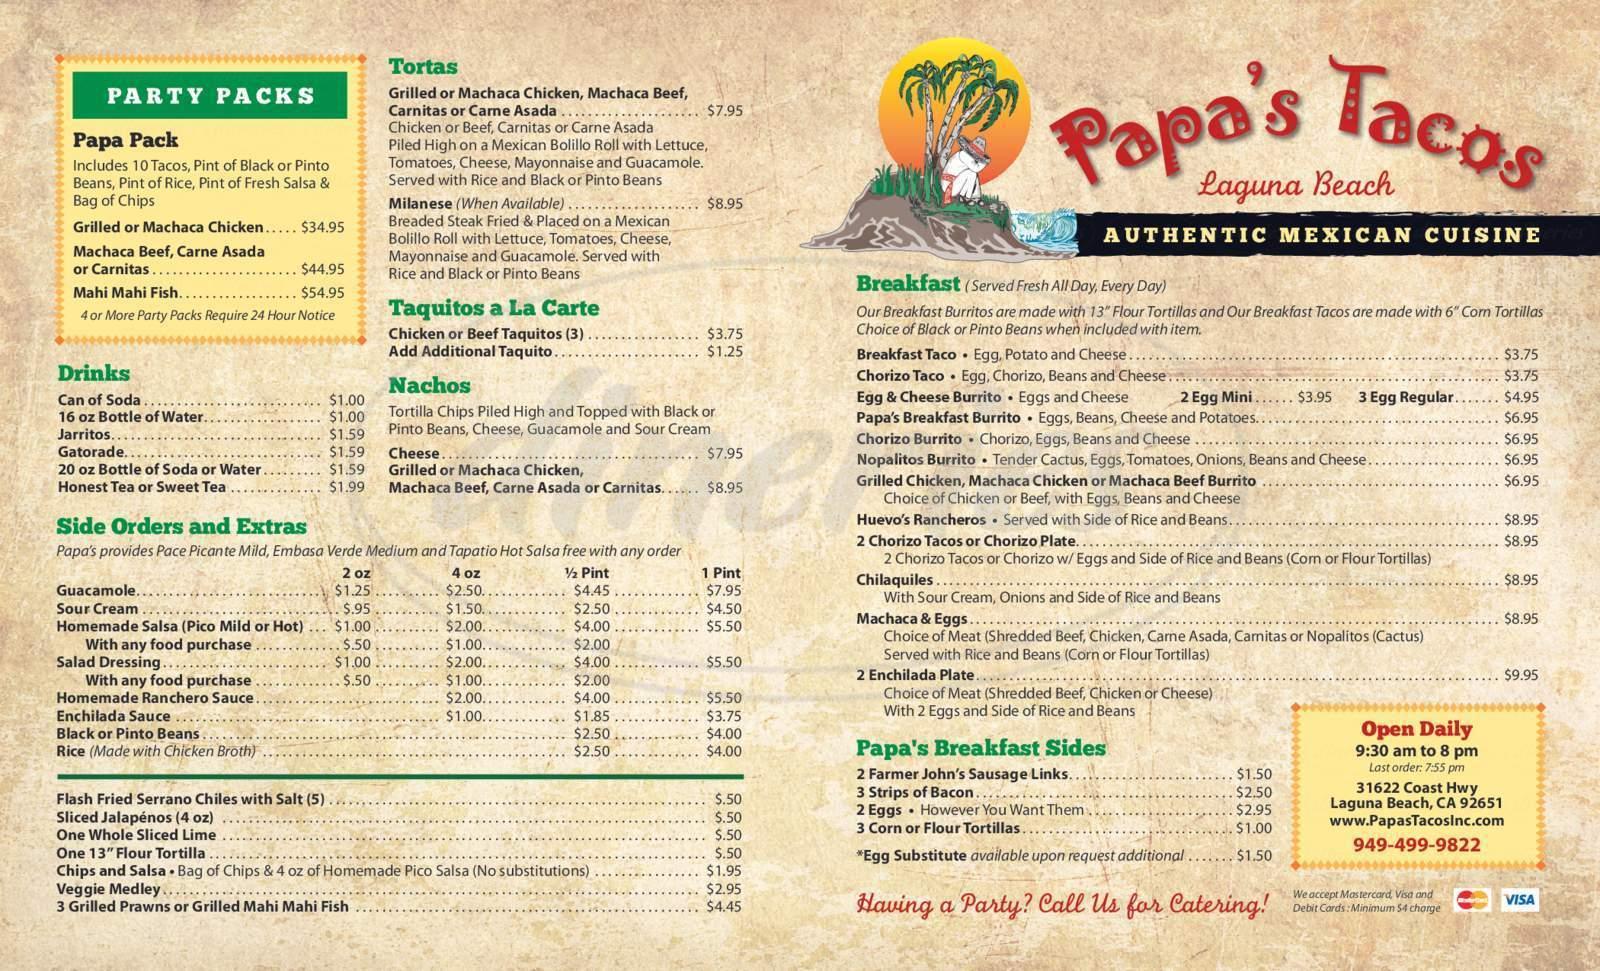 menu for Papa's Tacos